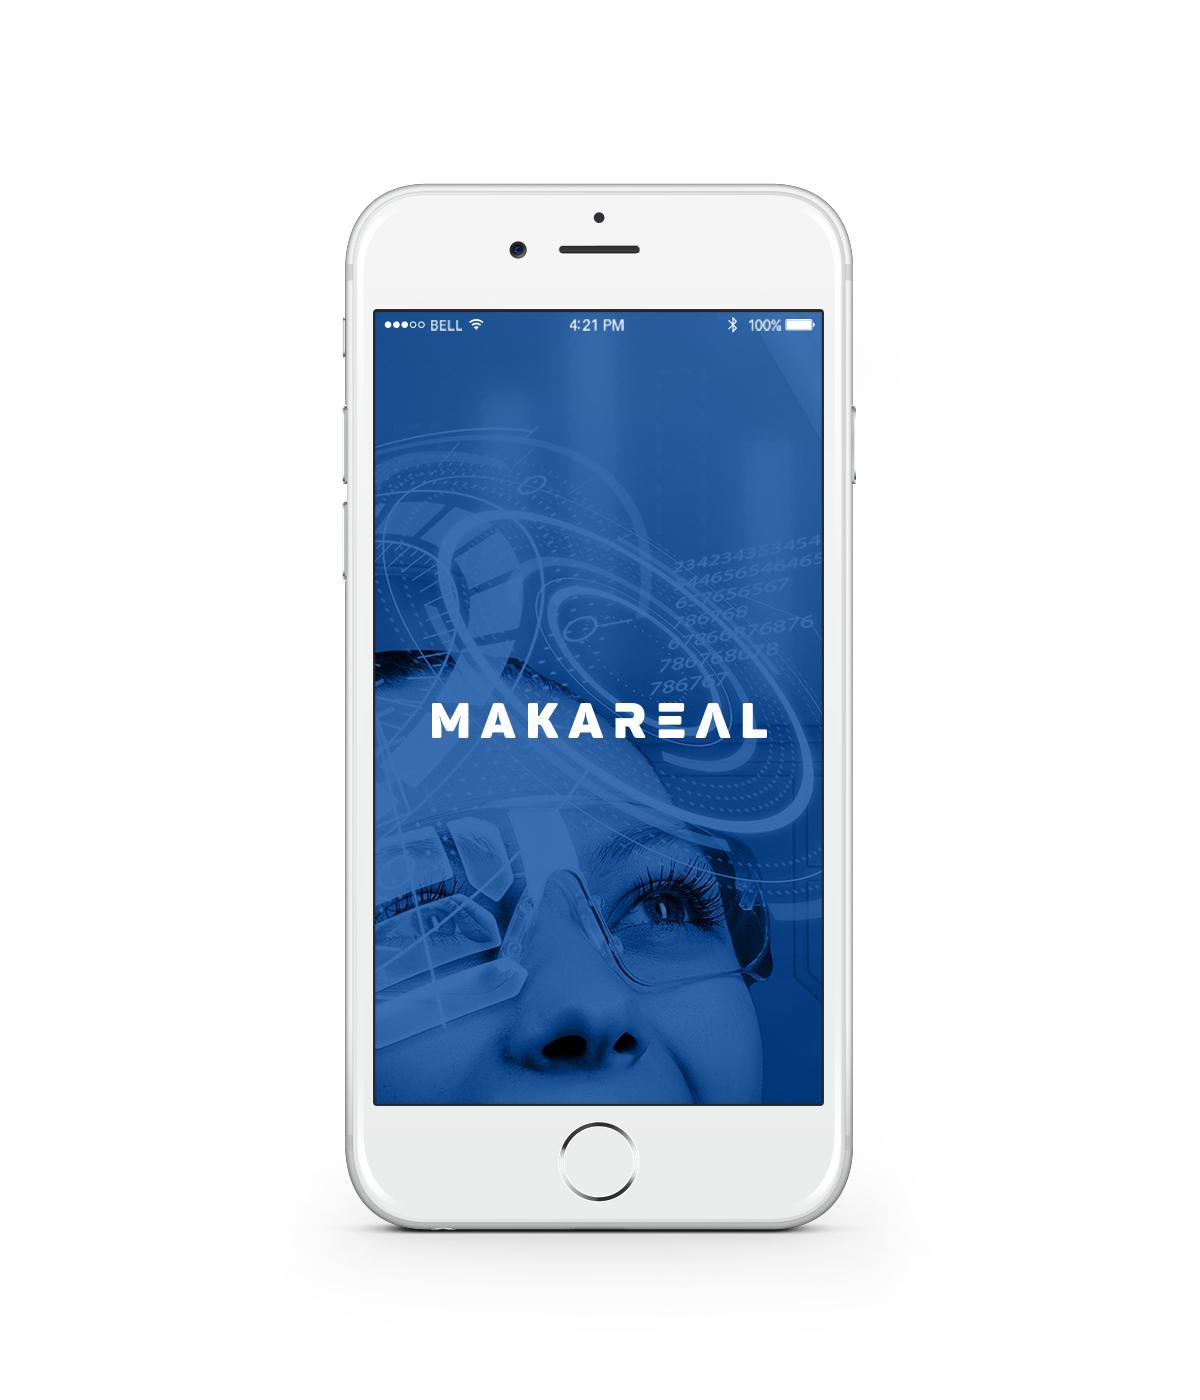 logo-conseil-it-realite-augmentee-autograff-graphiste-freelnace-toulouse-2018-app-mobile